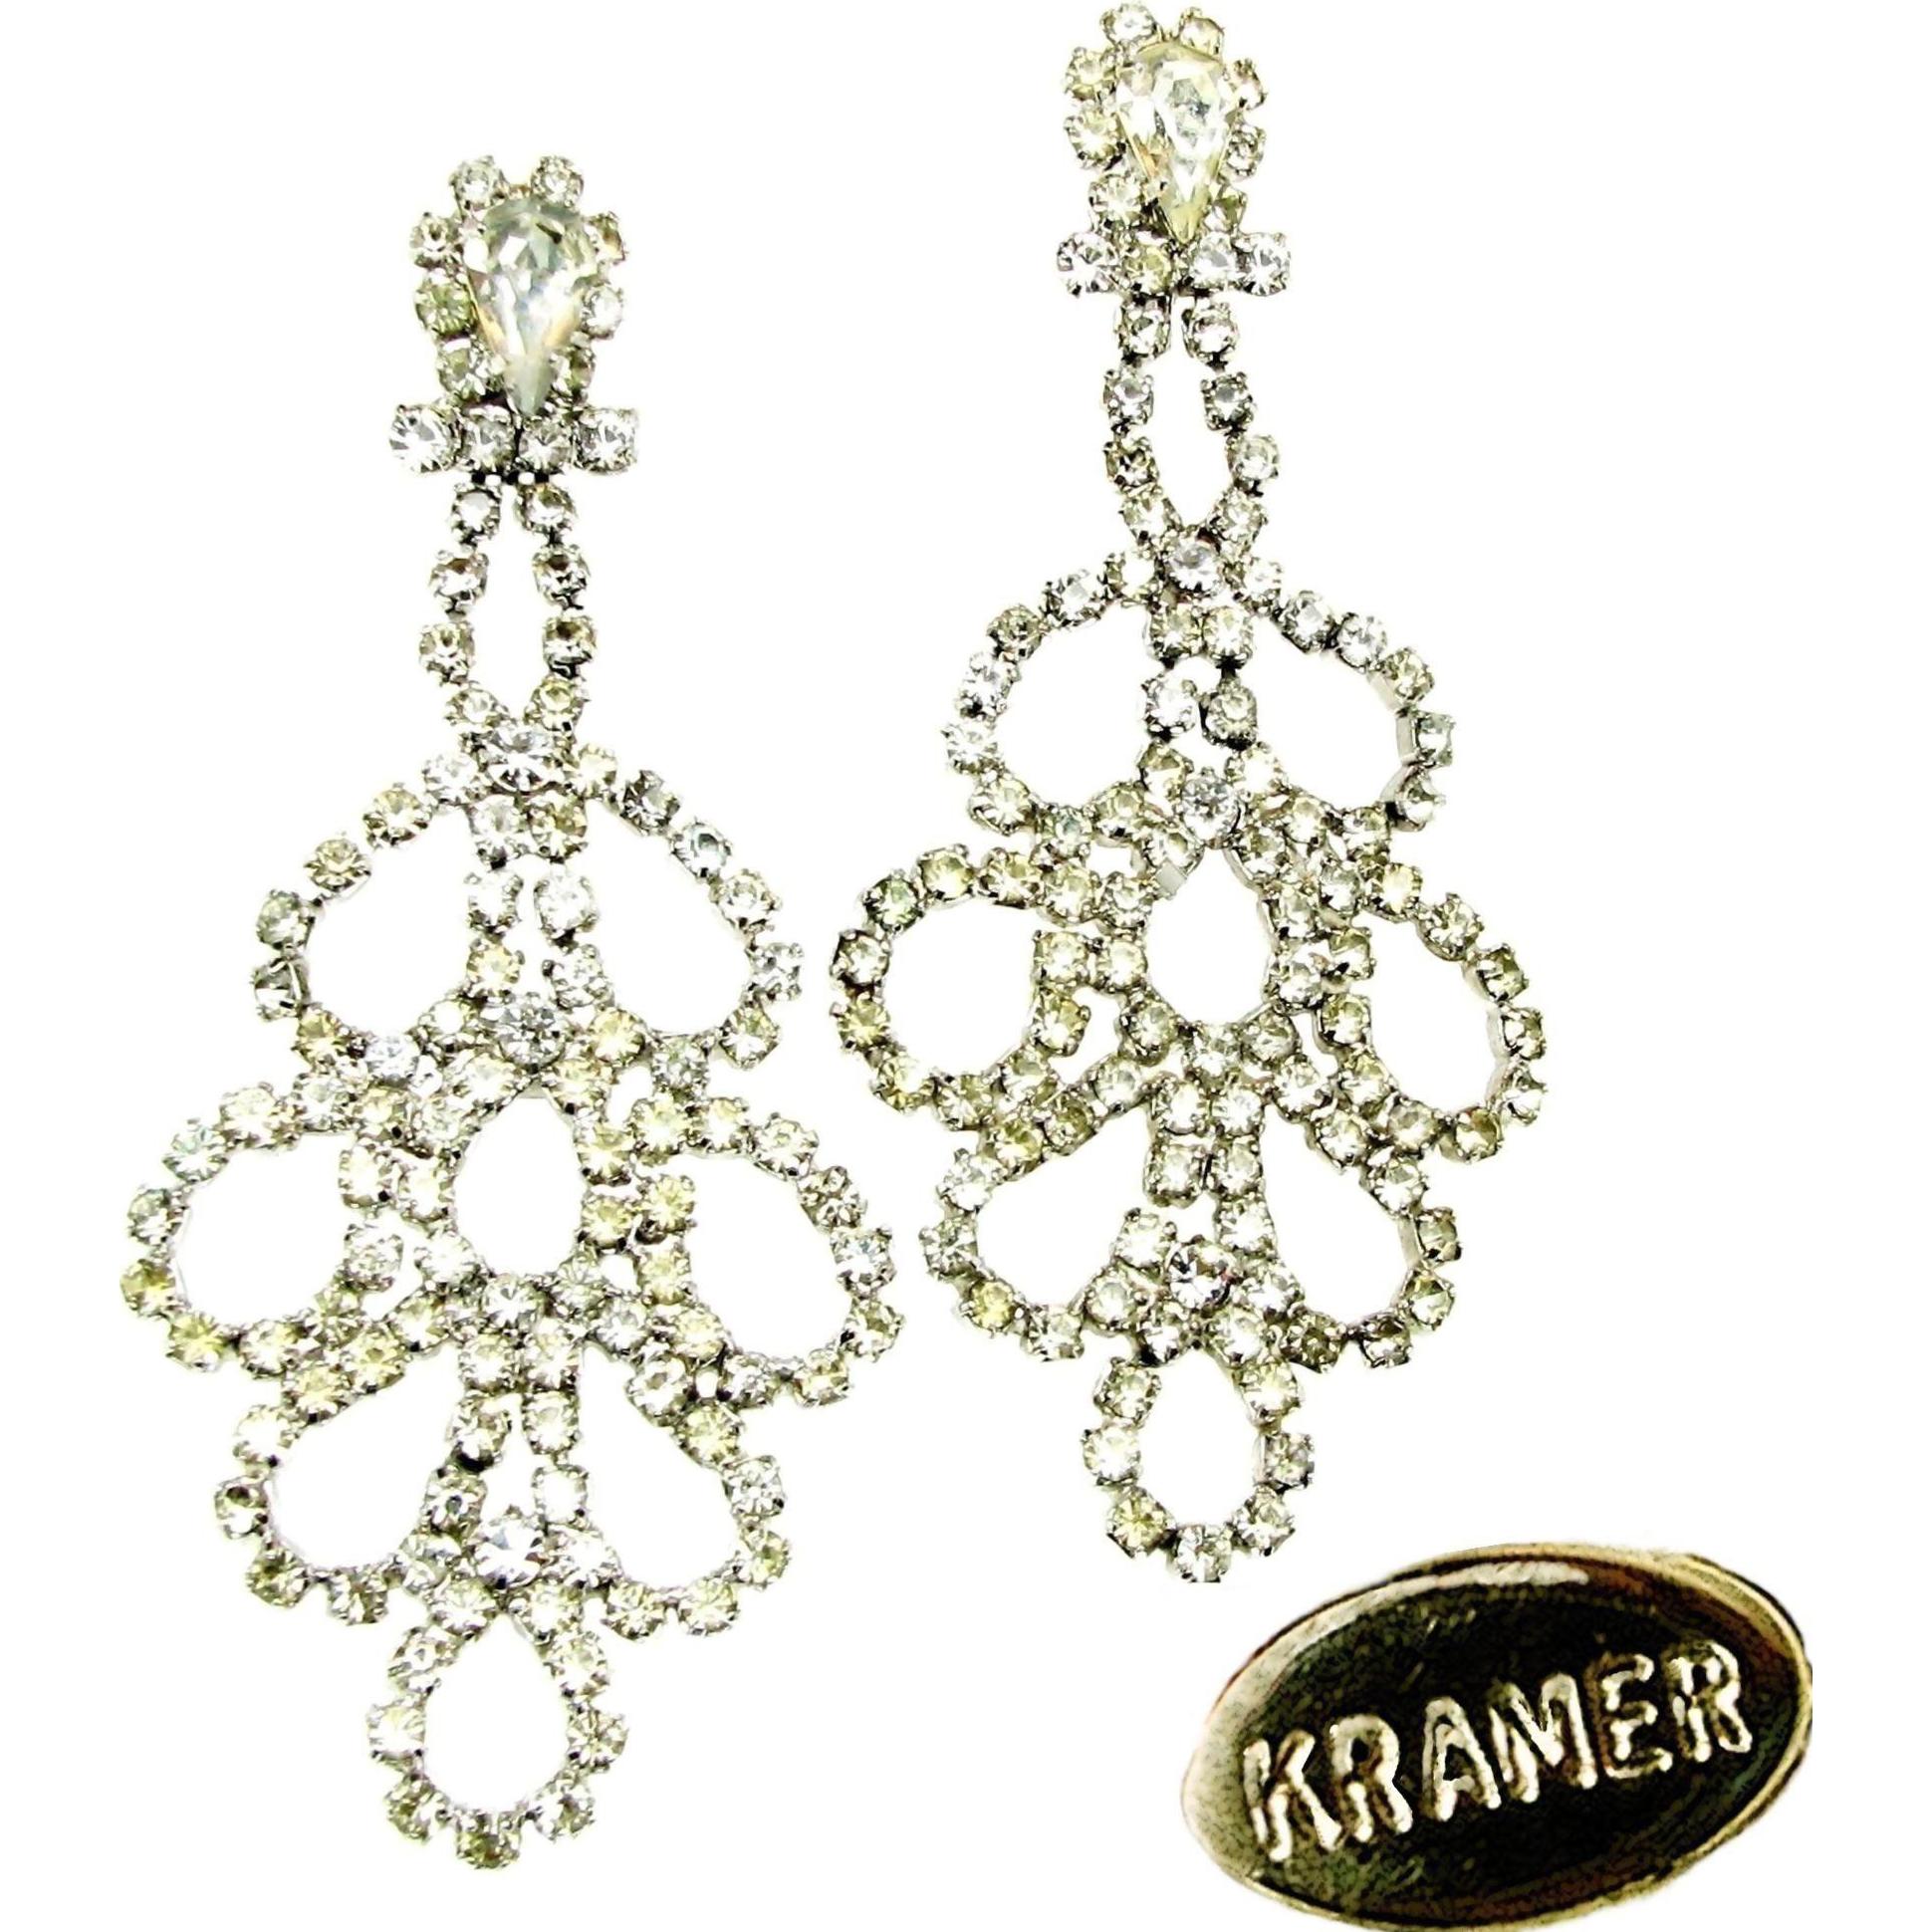 Vintage KRAMER Shoulder Duster Rhinestone Earrings 1940's Hollywood DIVA!